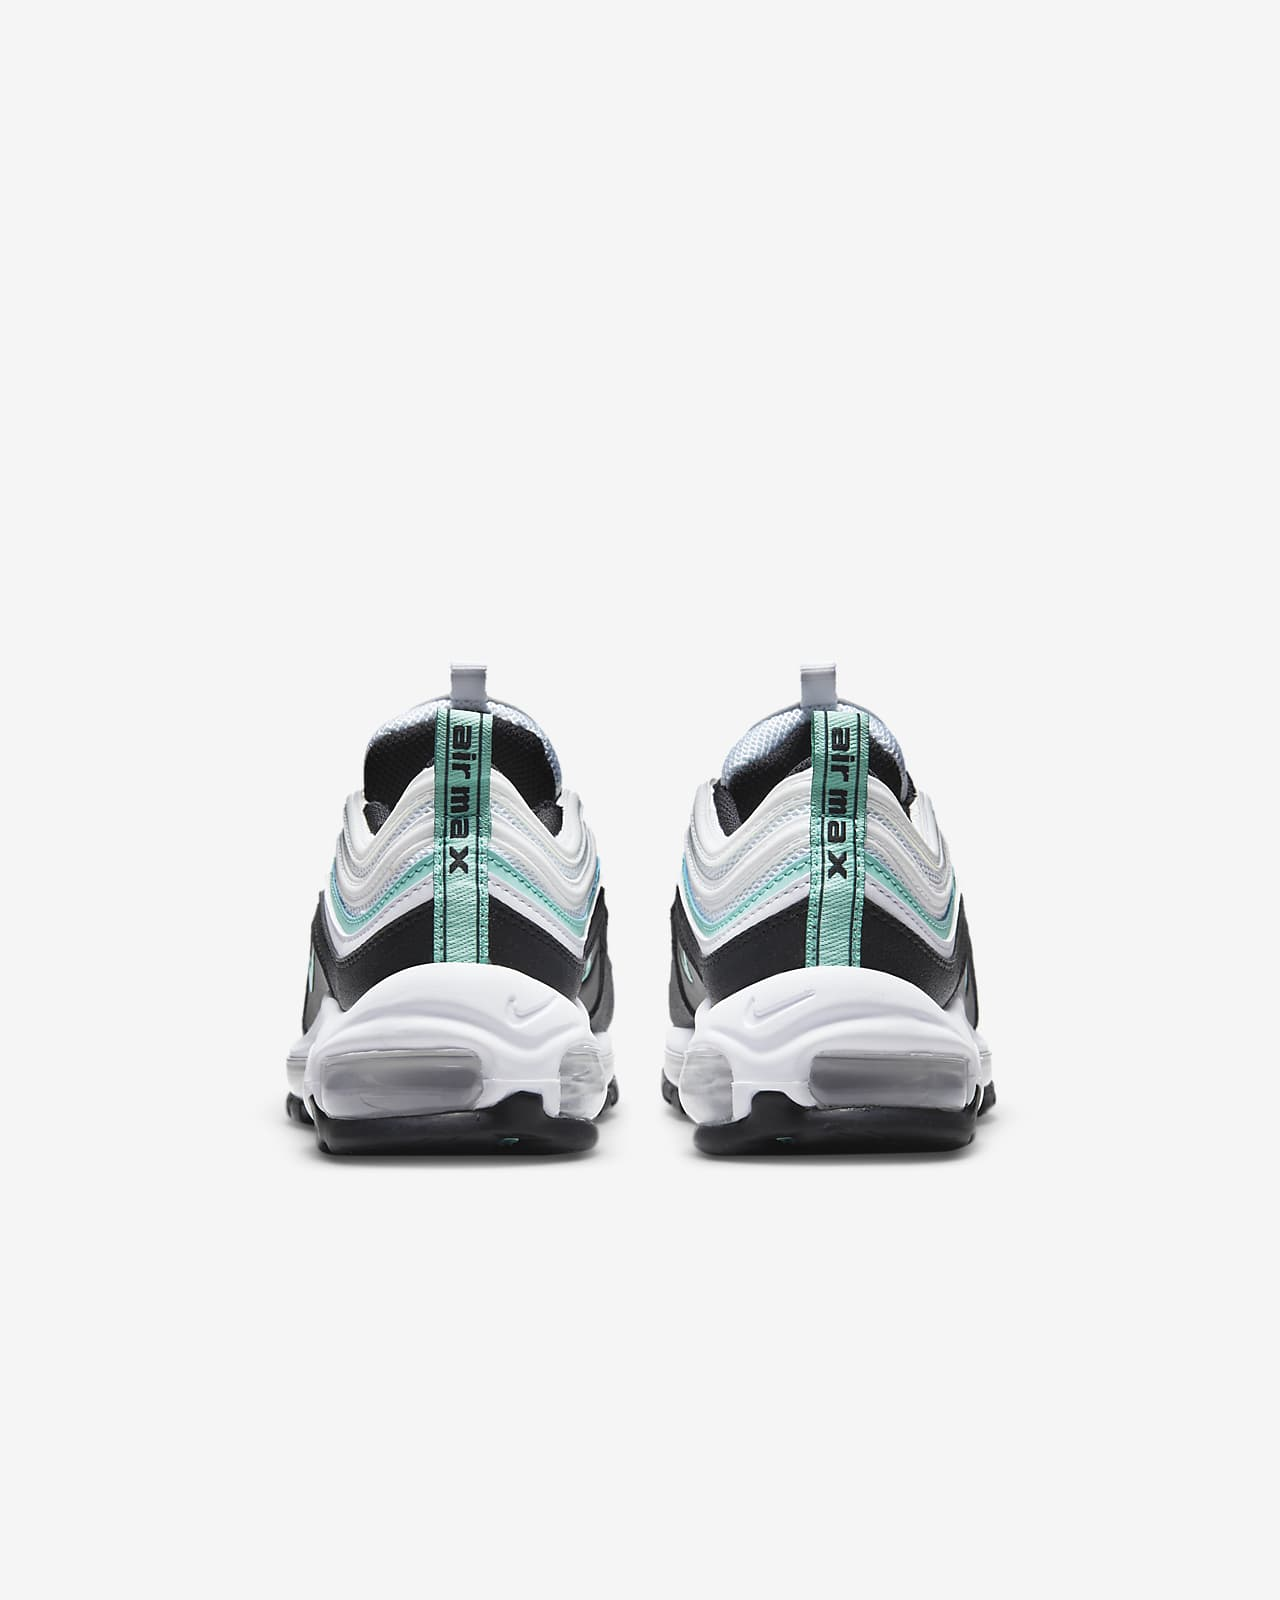 Chaussure Nike Air Max 97 pour Enfant plus âgé. Nike LU